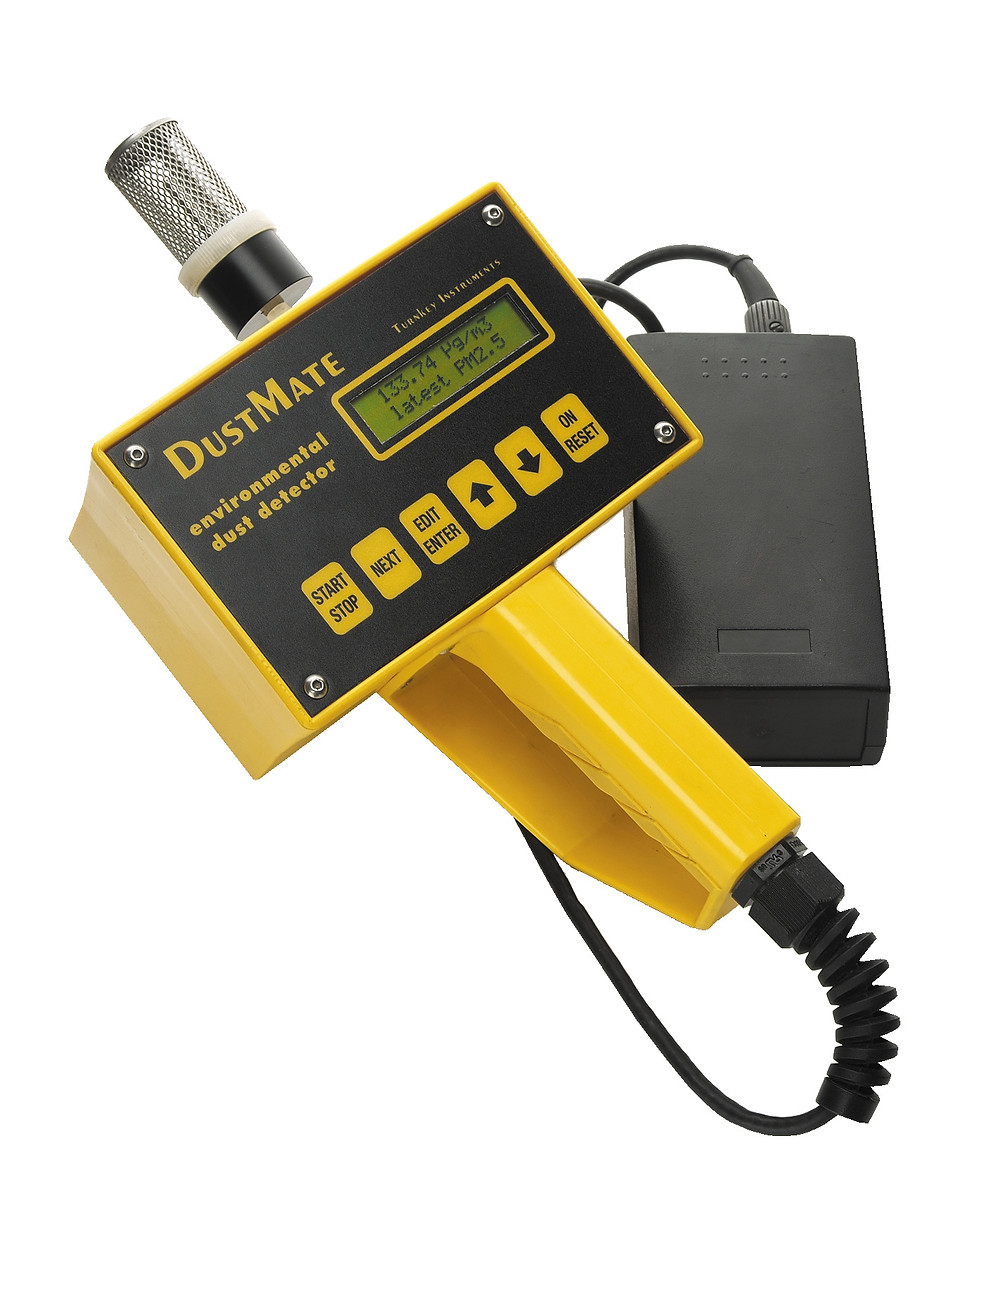 Turnkey Dustmate Handheld dust monitor